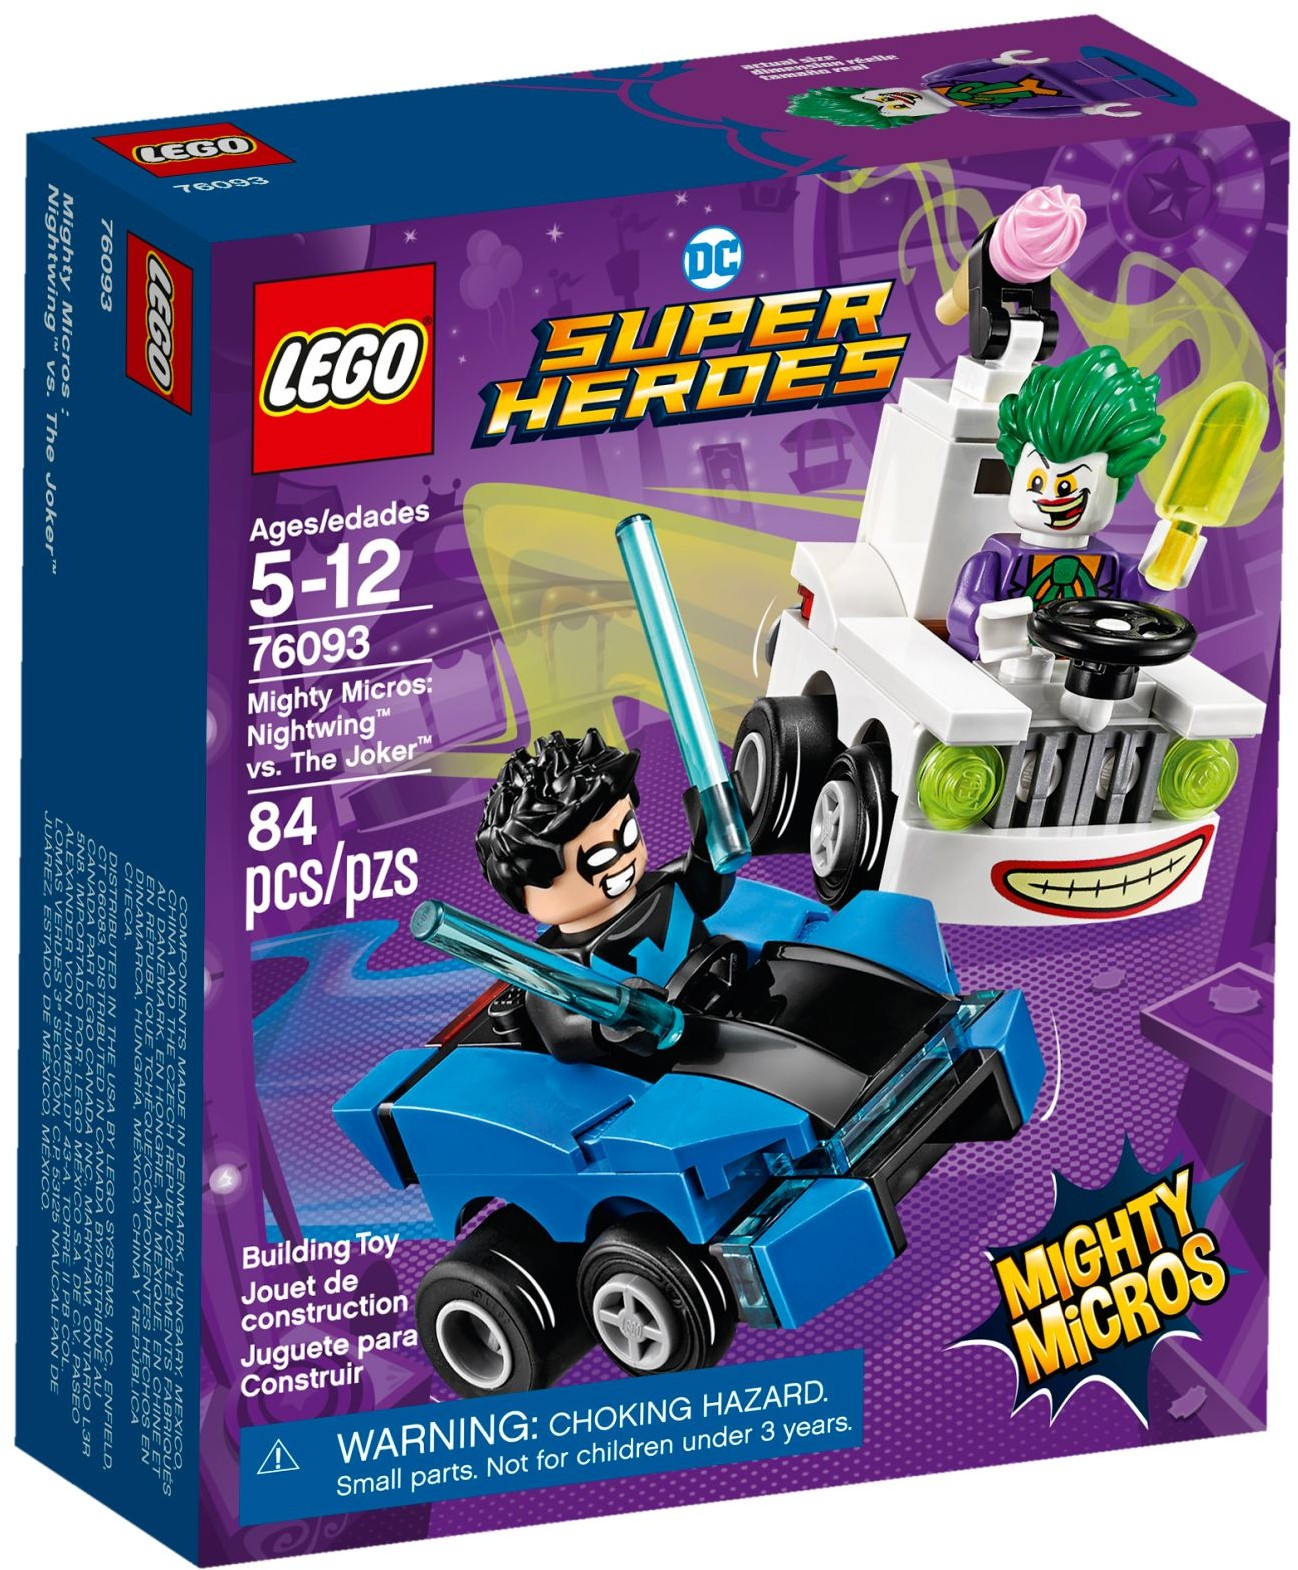 76093 Mighty Micros: Nightwing vs. The Joker